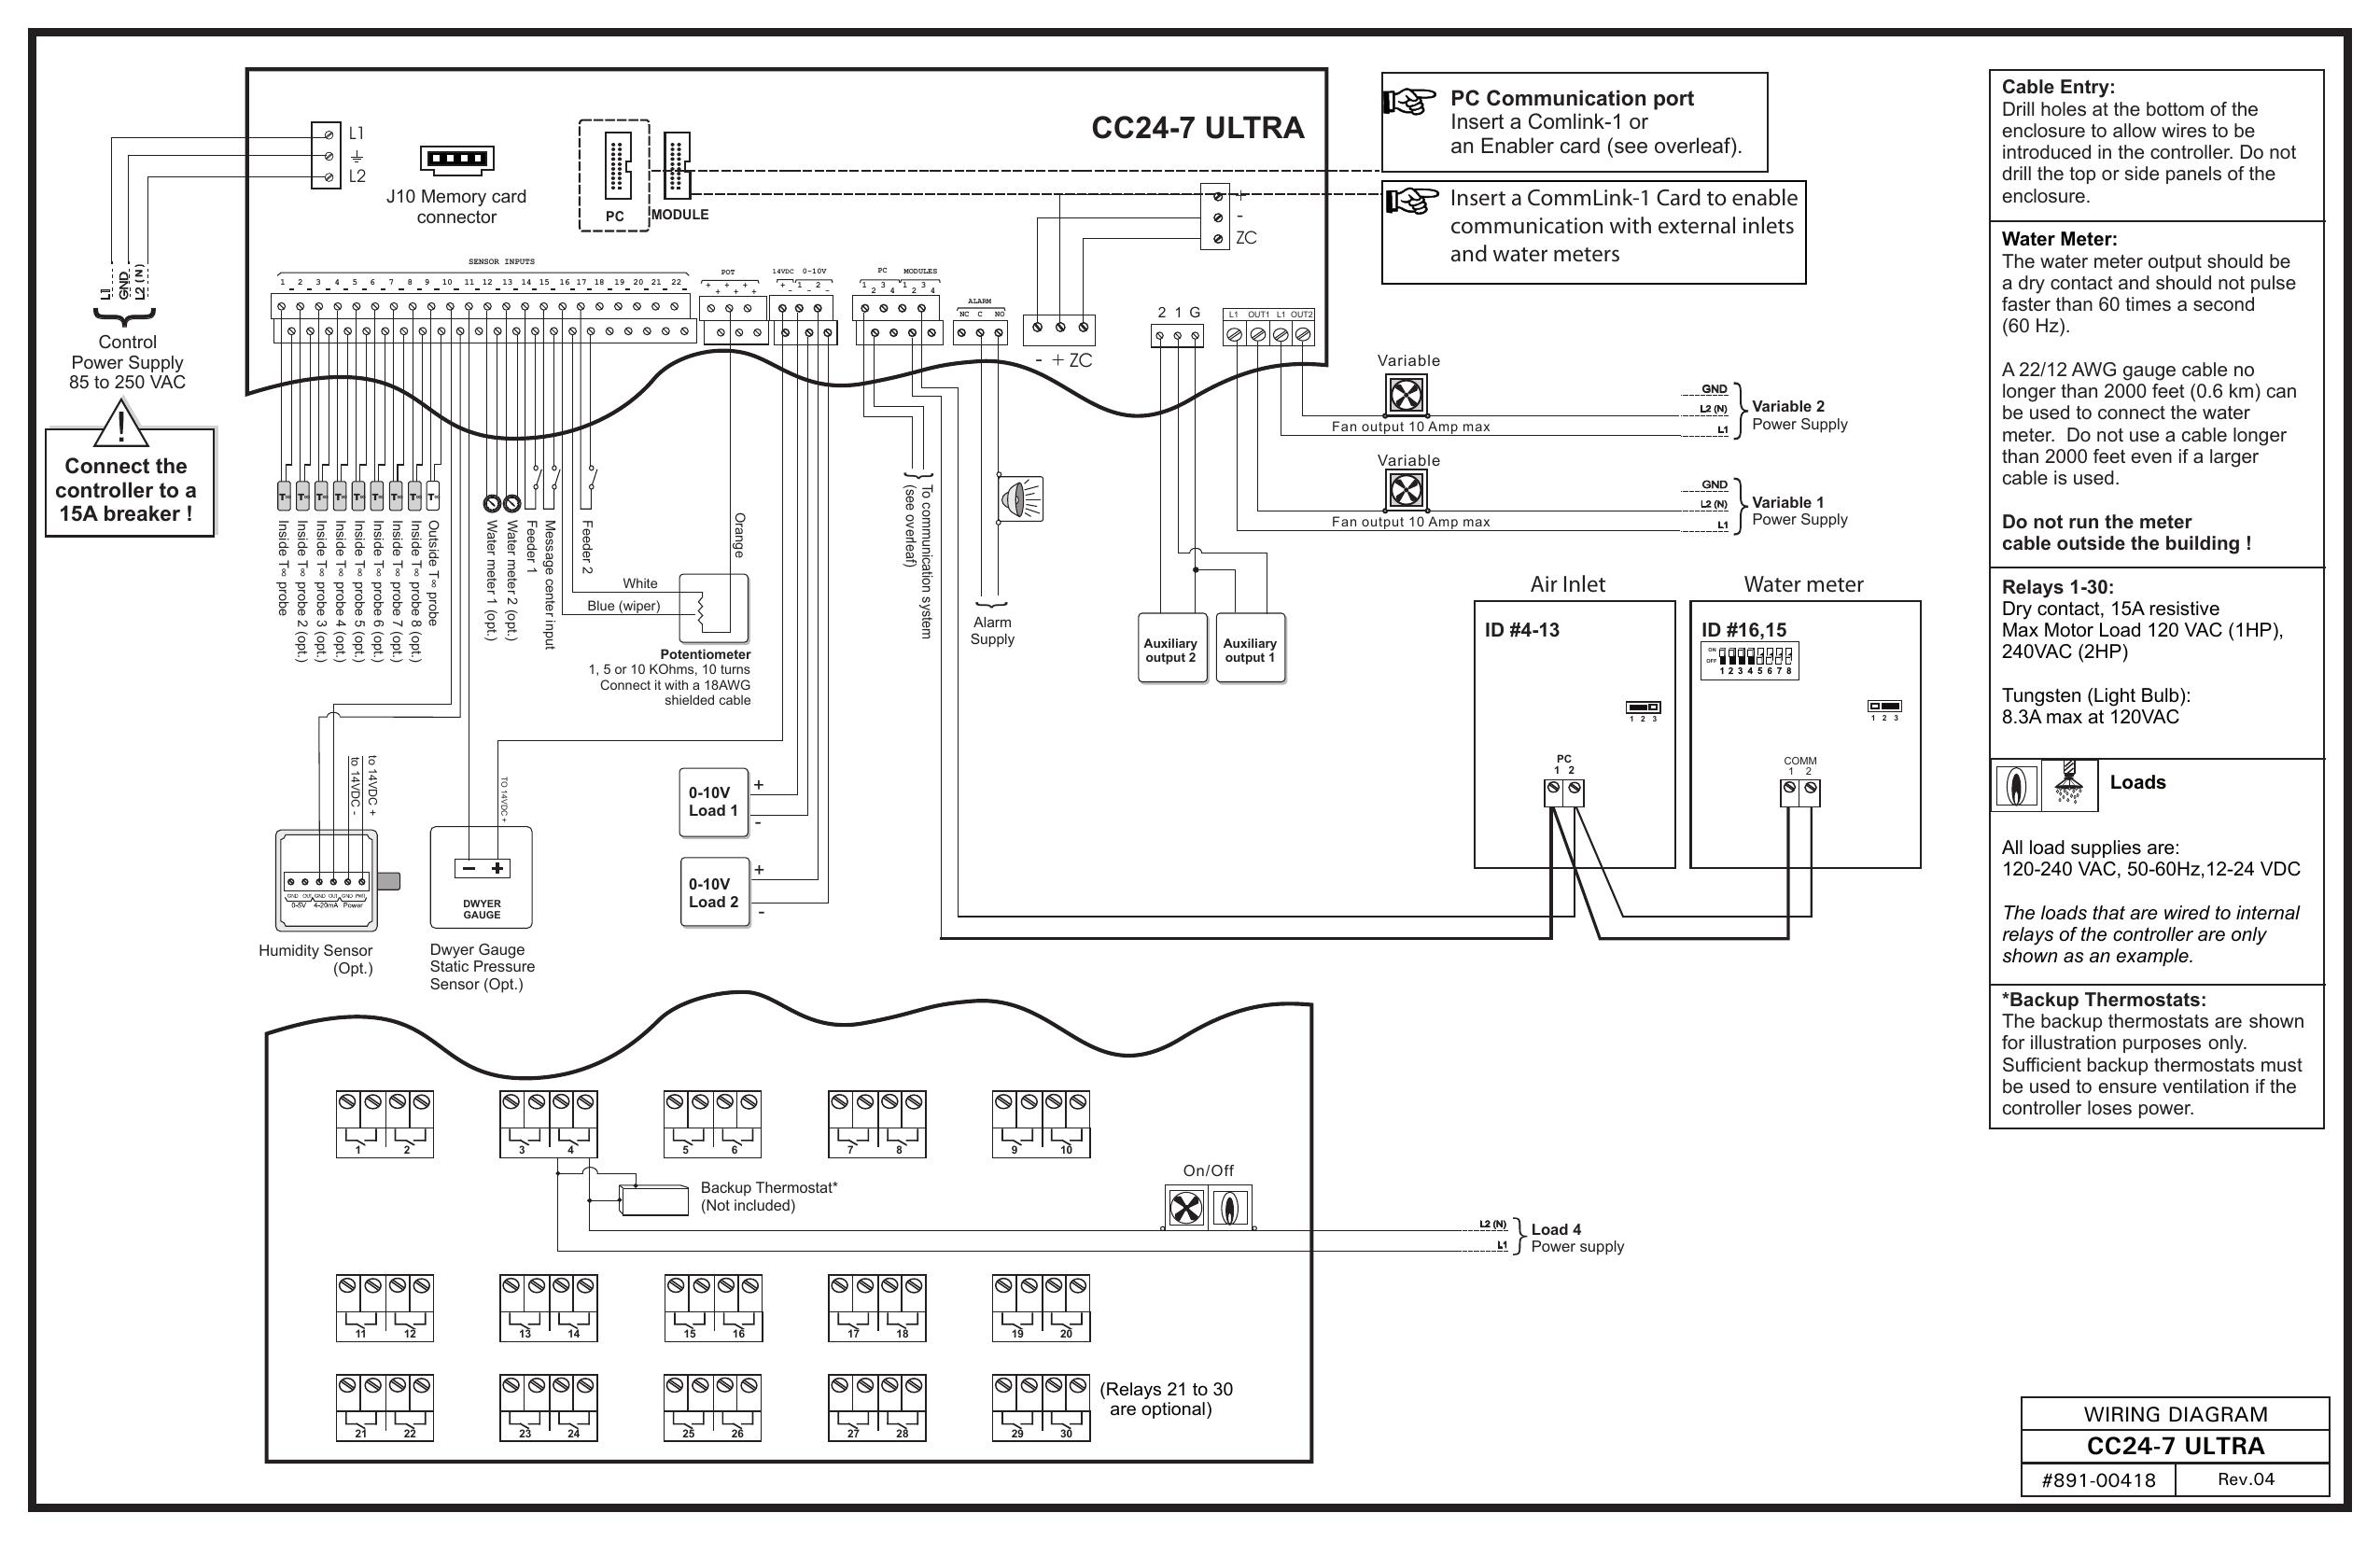 Munters 891-00418 SCH CC24-7 ULTRA EN Product information